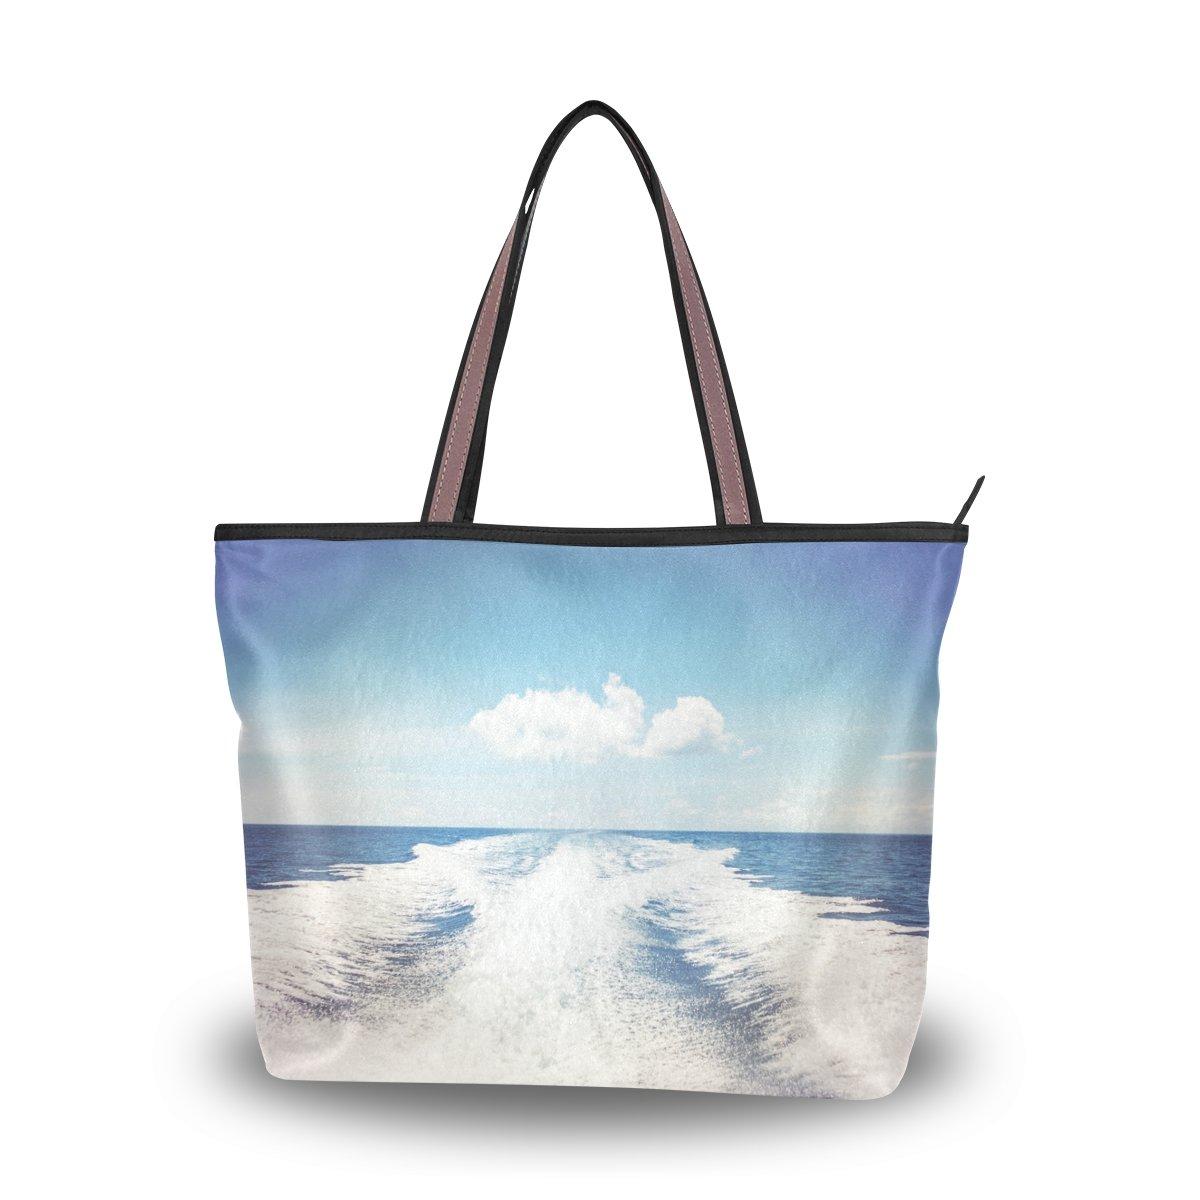 imobaby Ocean Women Large Tote Shoulder BagsTop Handle Handbag TE205